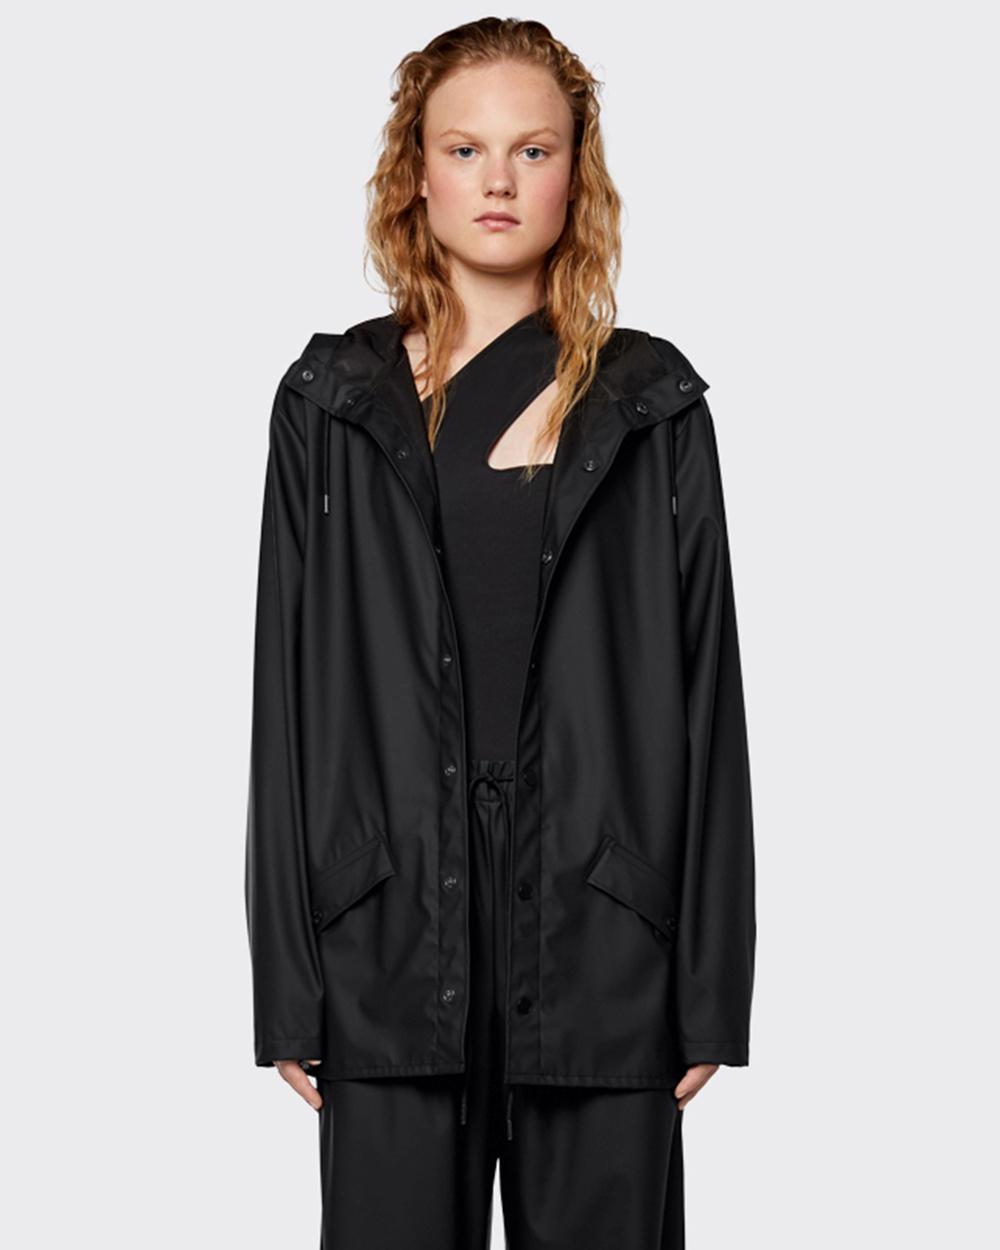 RAINS Jacket Accessories Black